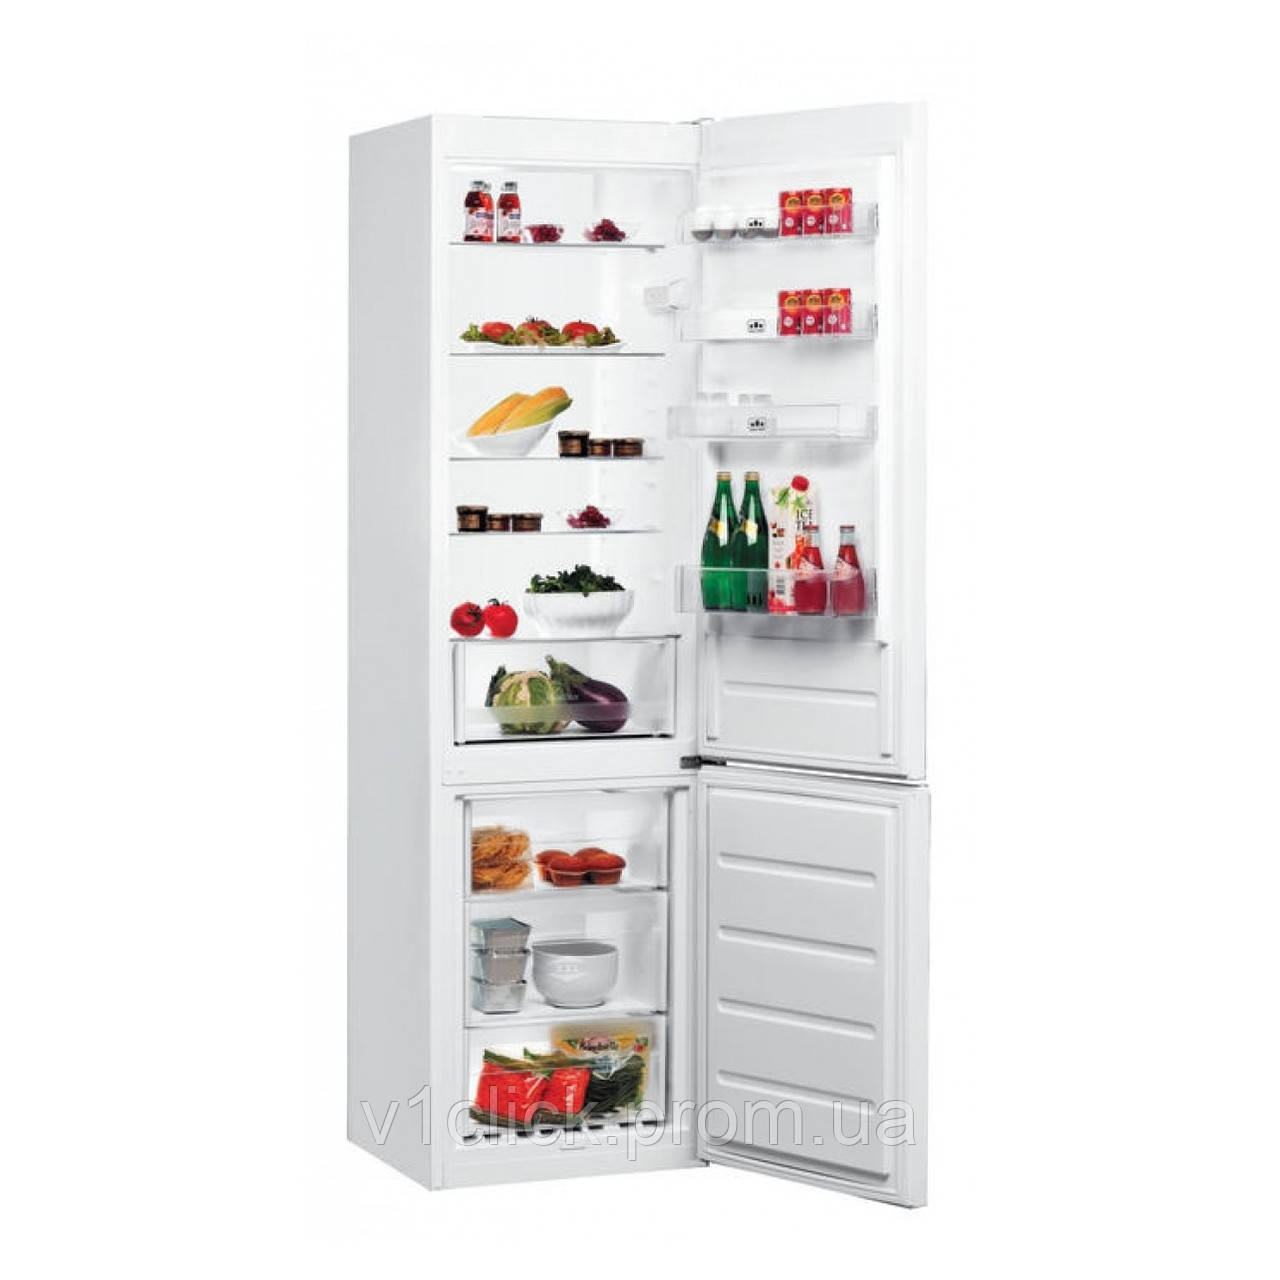 Холодильник Whirlpool 9121OW